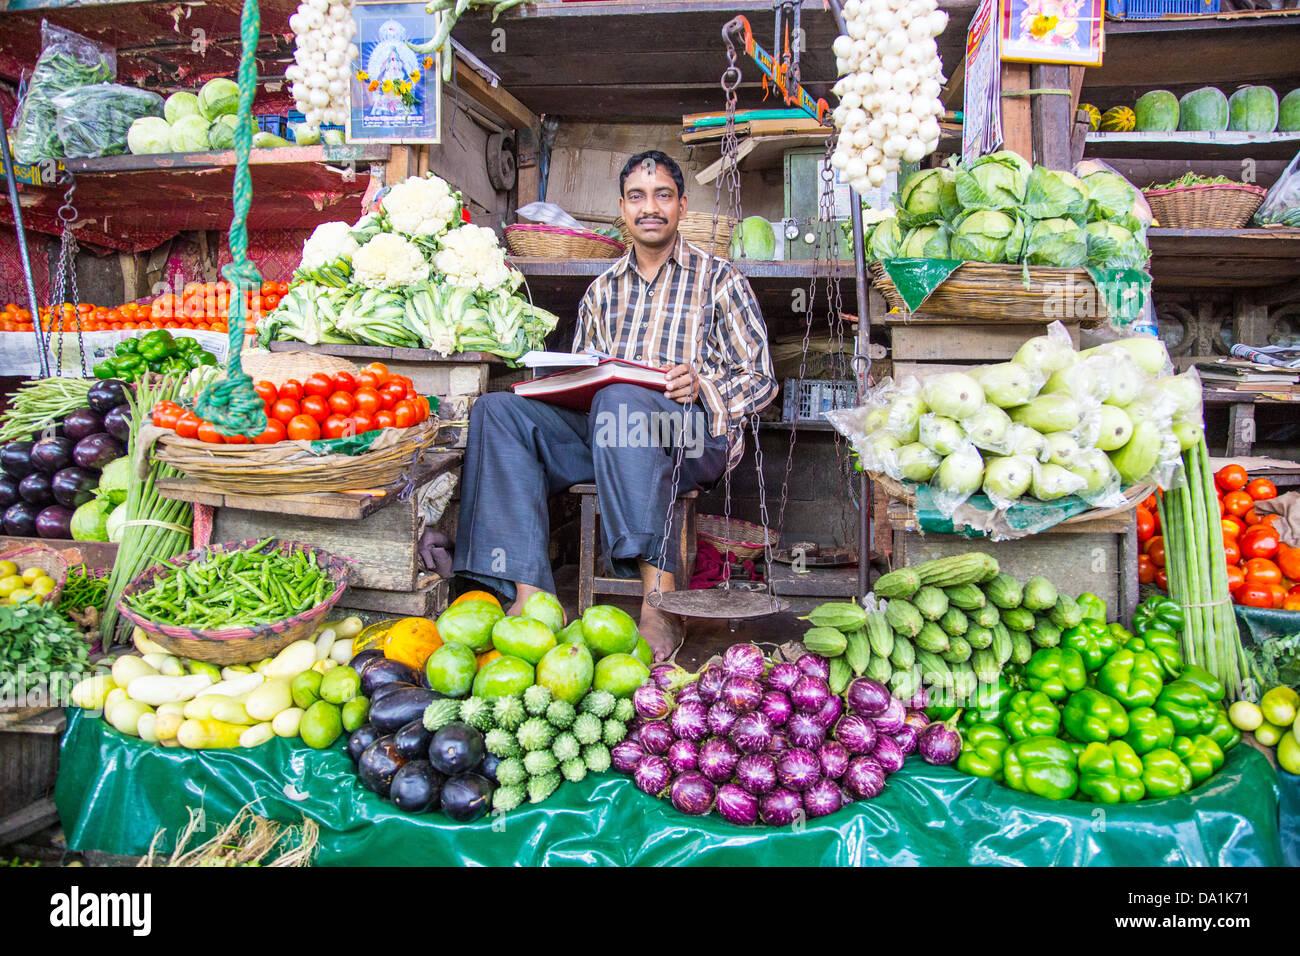 Vendeur de légumes, marché Crawford, Mumbai, Inde Photo Stock